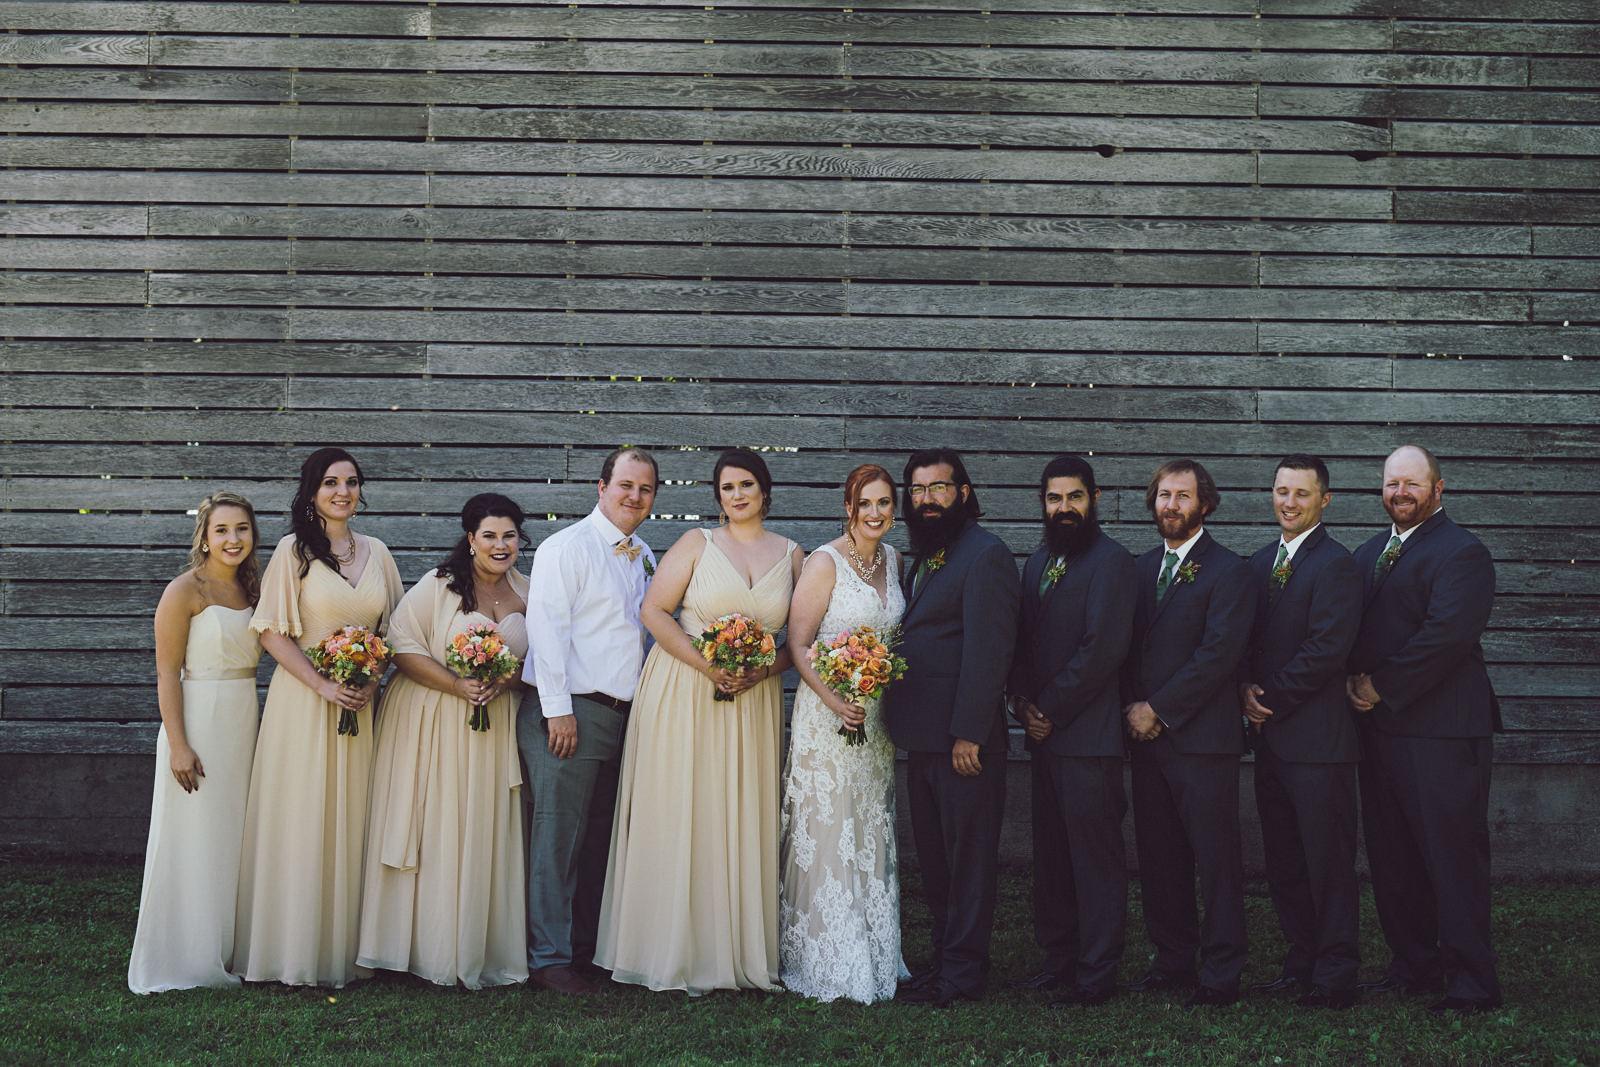 wedding-keely-caleb-567-name-your-photo.jpg